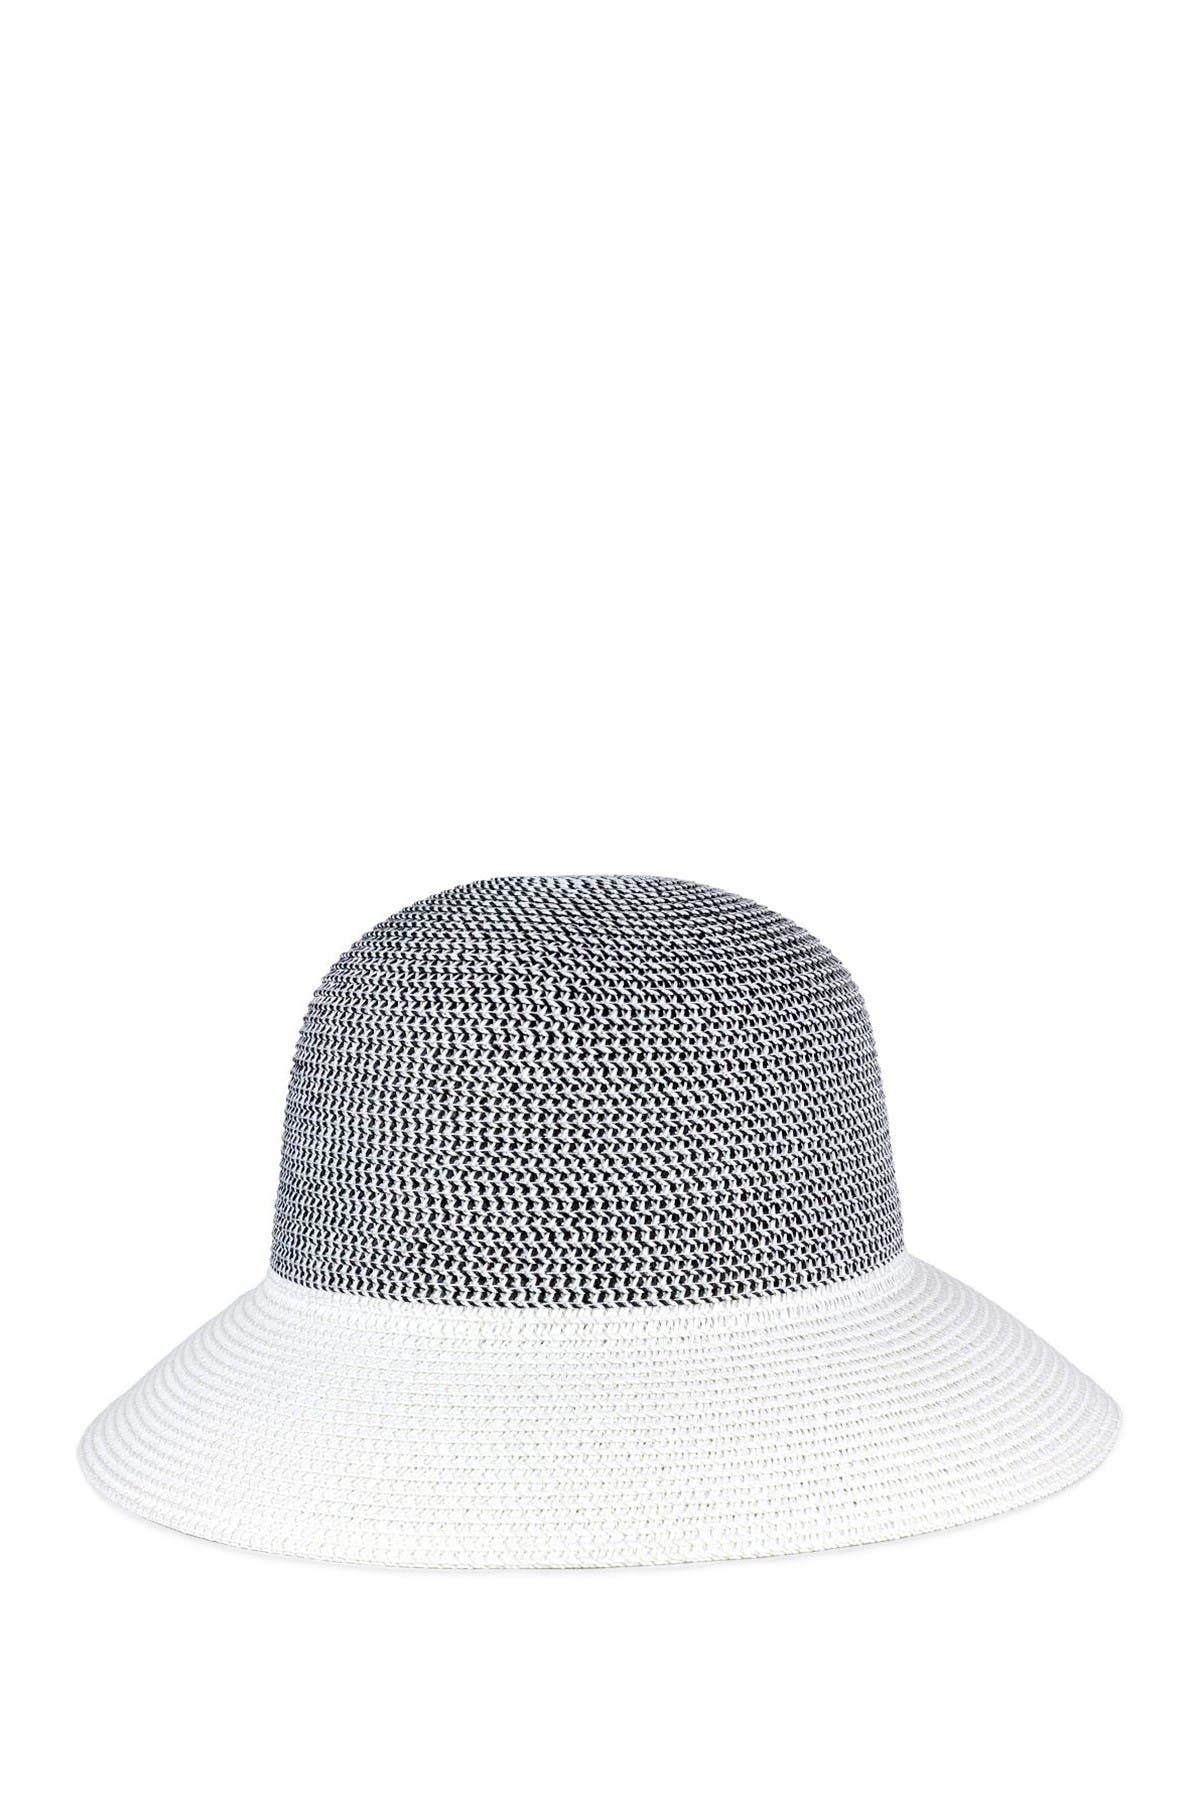 Image of Just Jamie Magid Bucket Hat